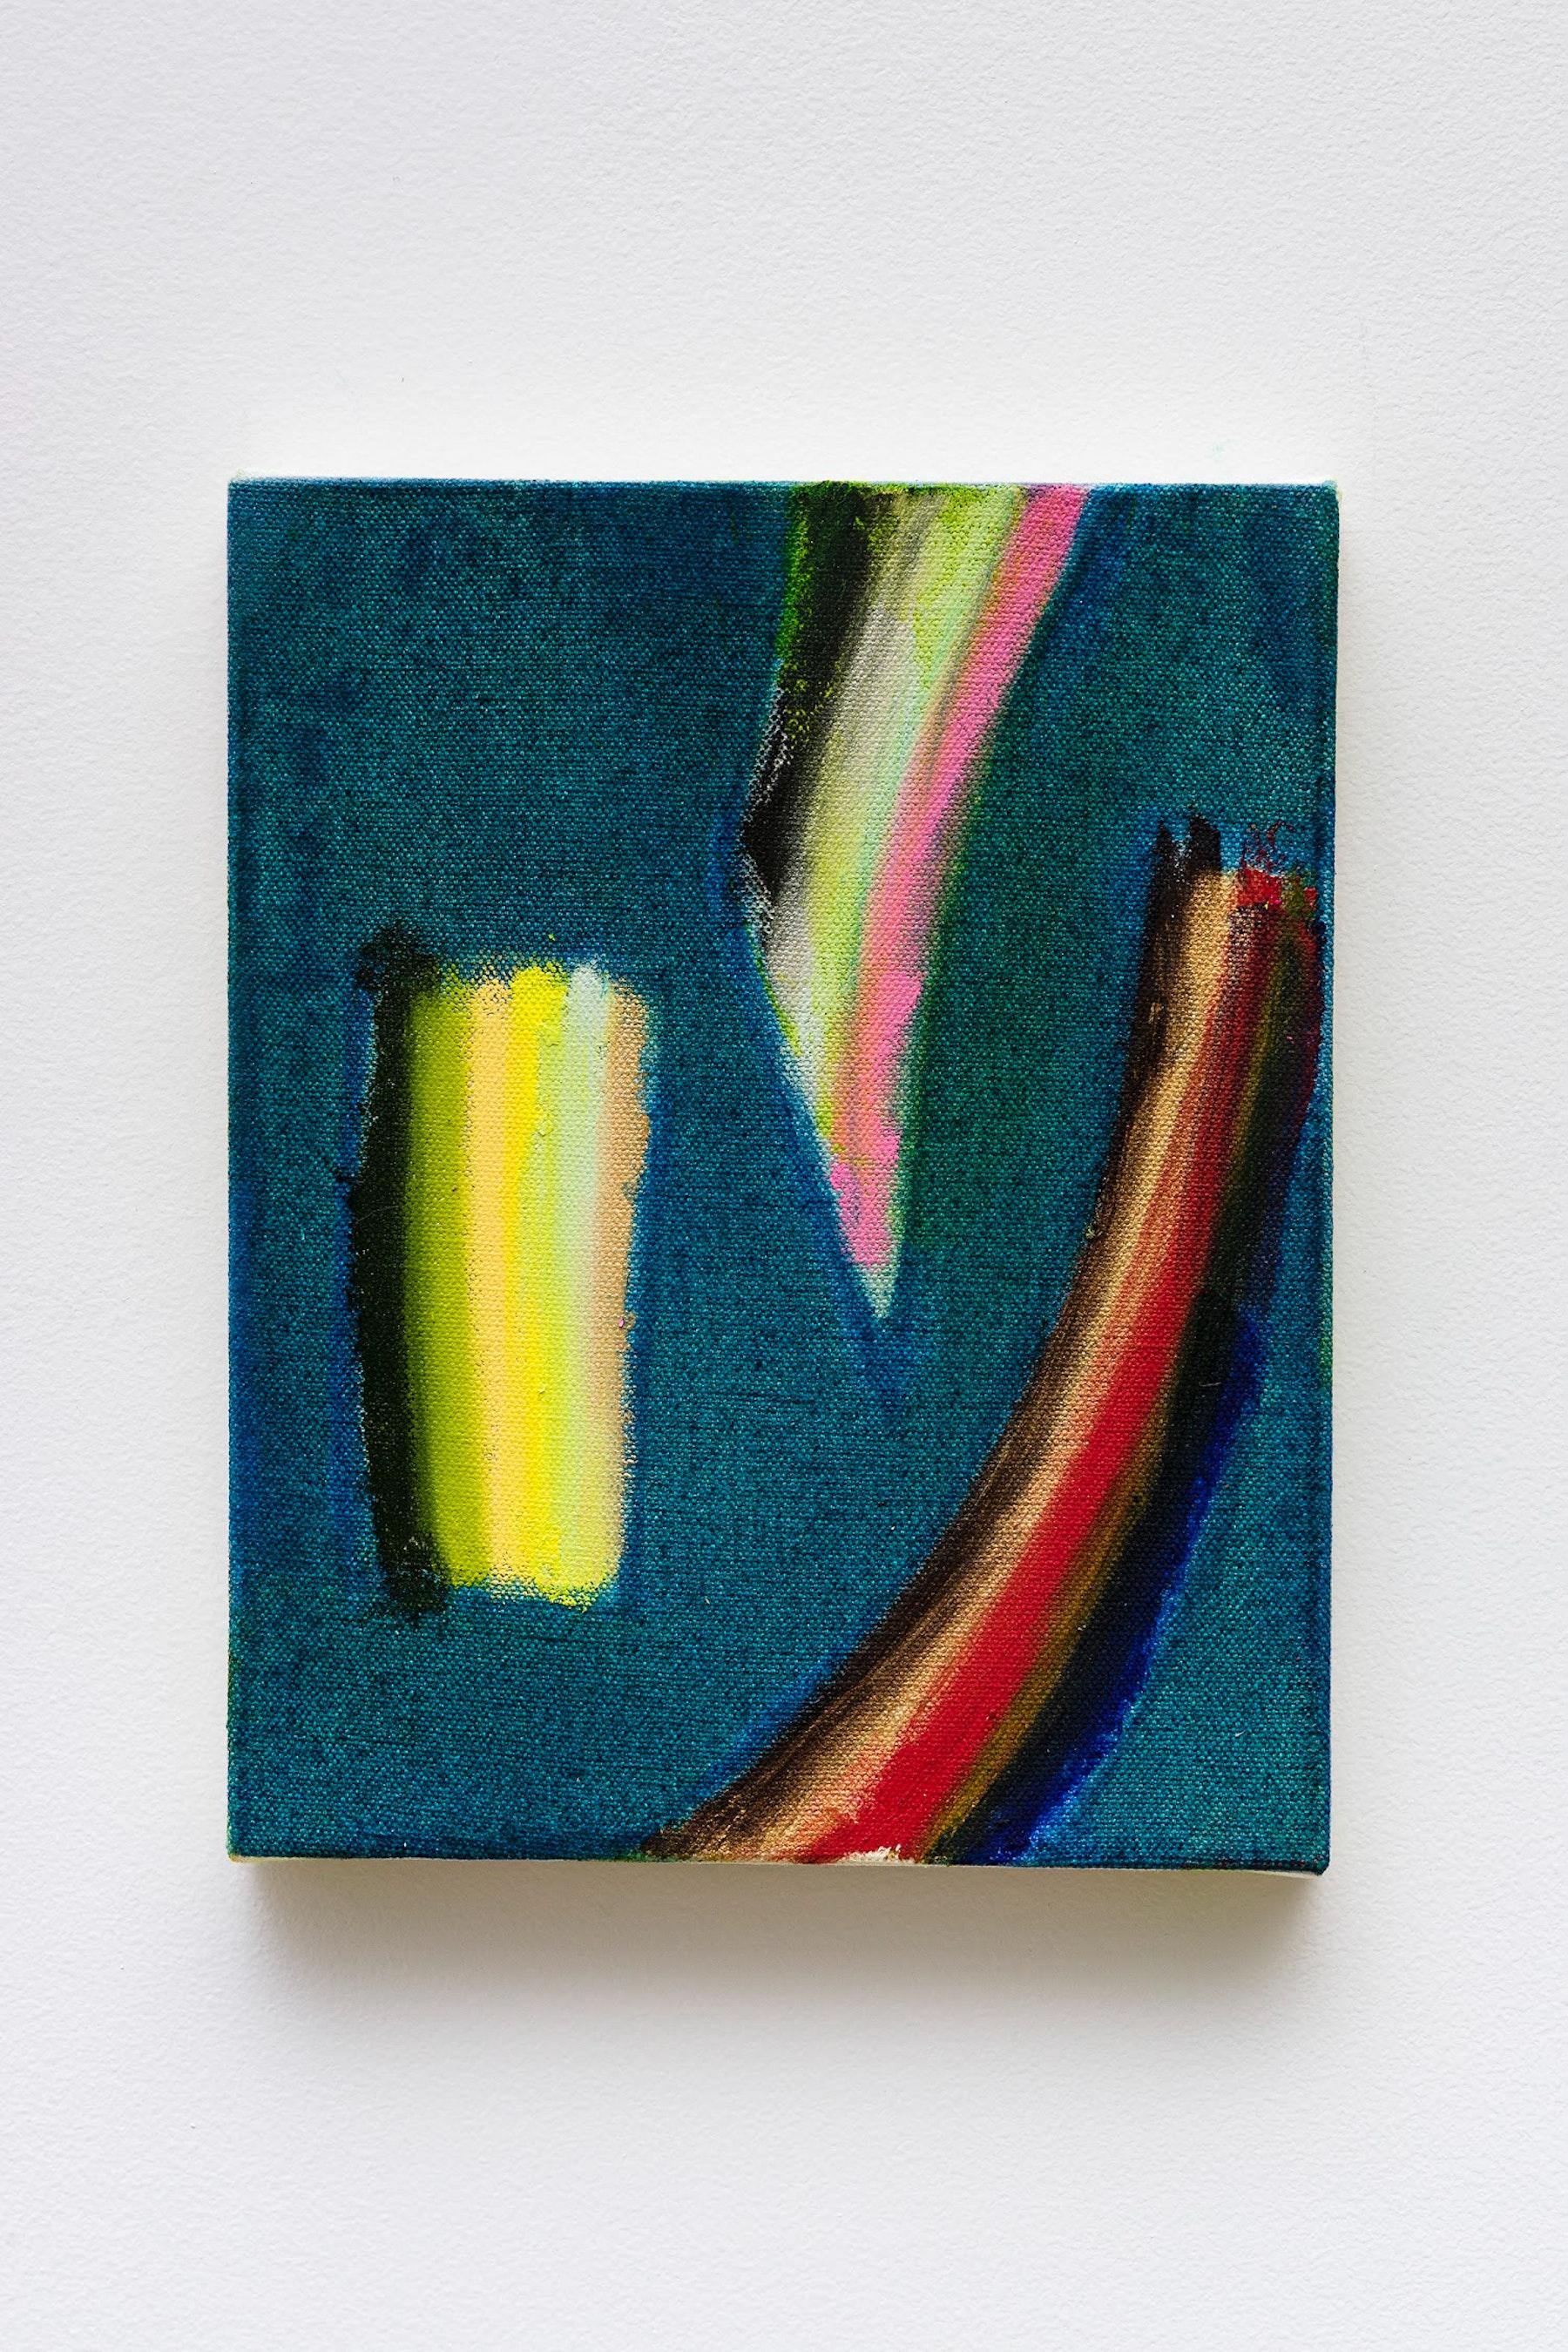 "Monique Van Genderen ""Untitled,"" 2020 Oil on canvas 10 x 8"" [HxW] (25.4 x 20.32 cm) Inventory #VGE391 Courtesy of the artist and Vielmetter Los Angeles Photo credit: Jeff Mclane"